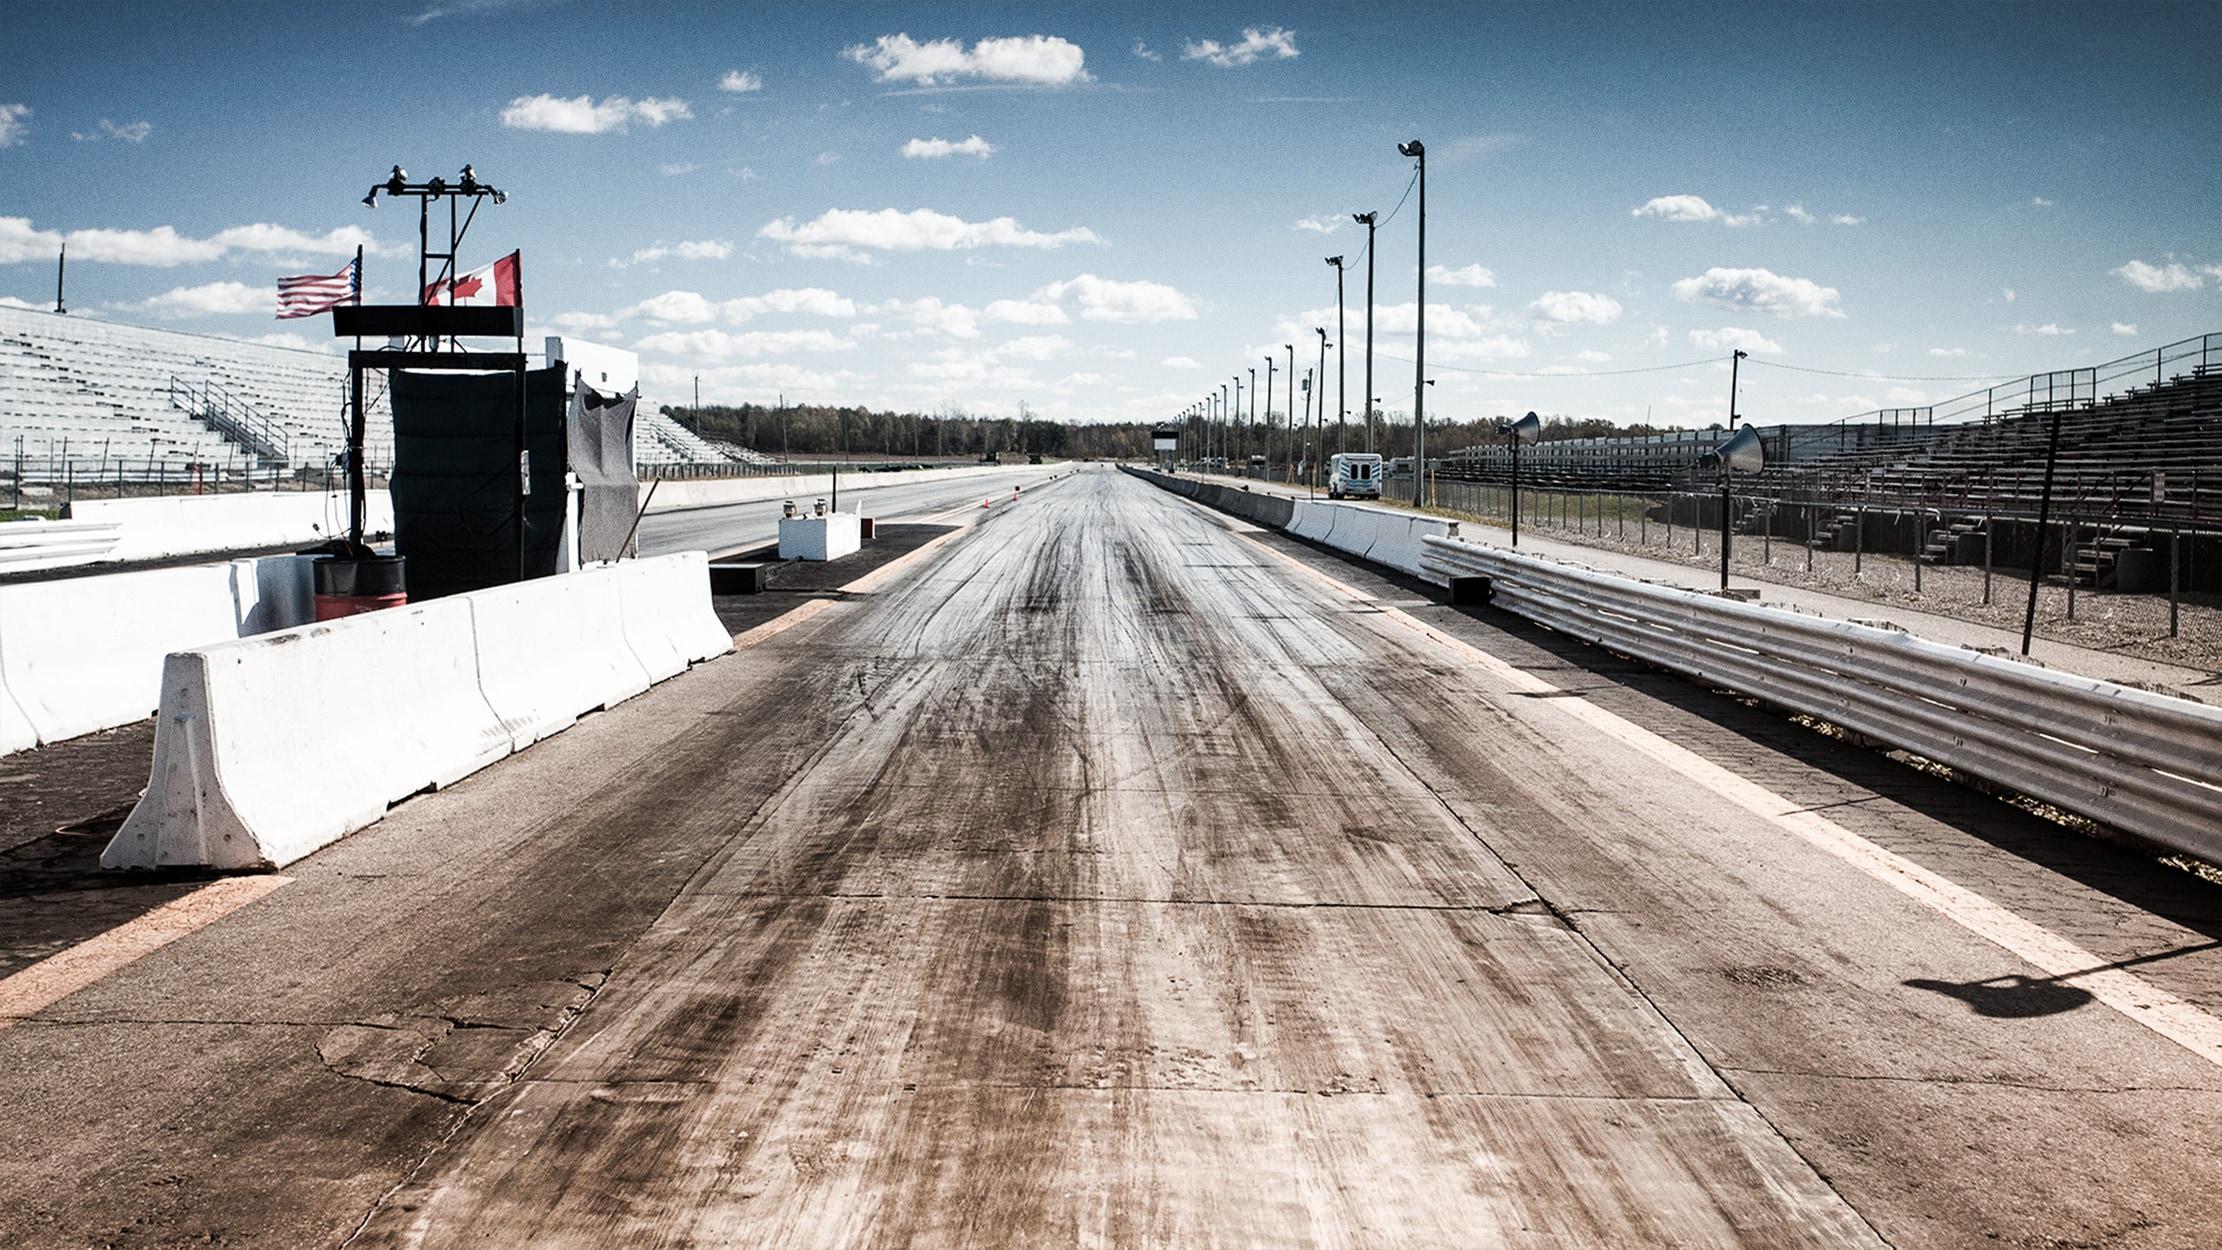 NHRA Drag Racing - E3 Spark Plugs NHRA Nationals